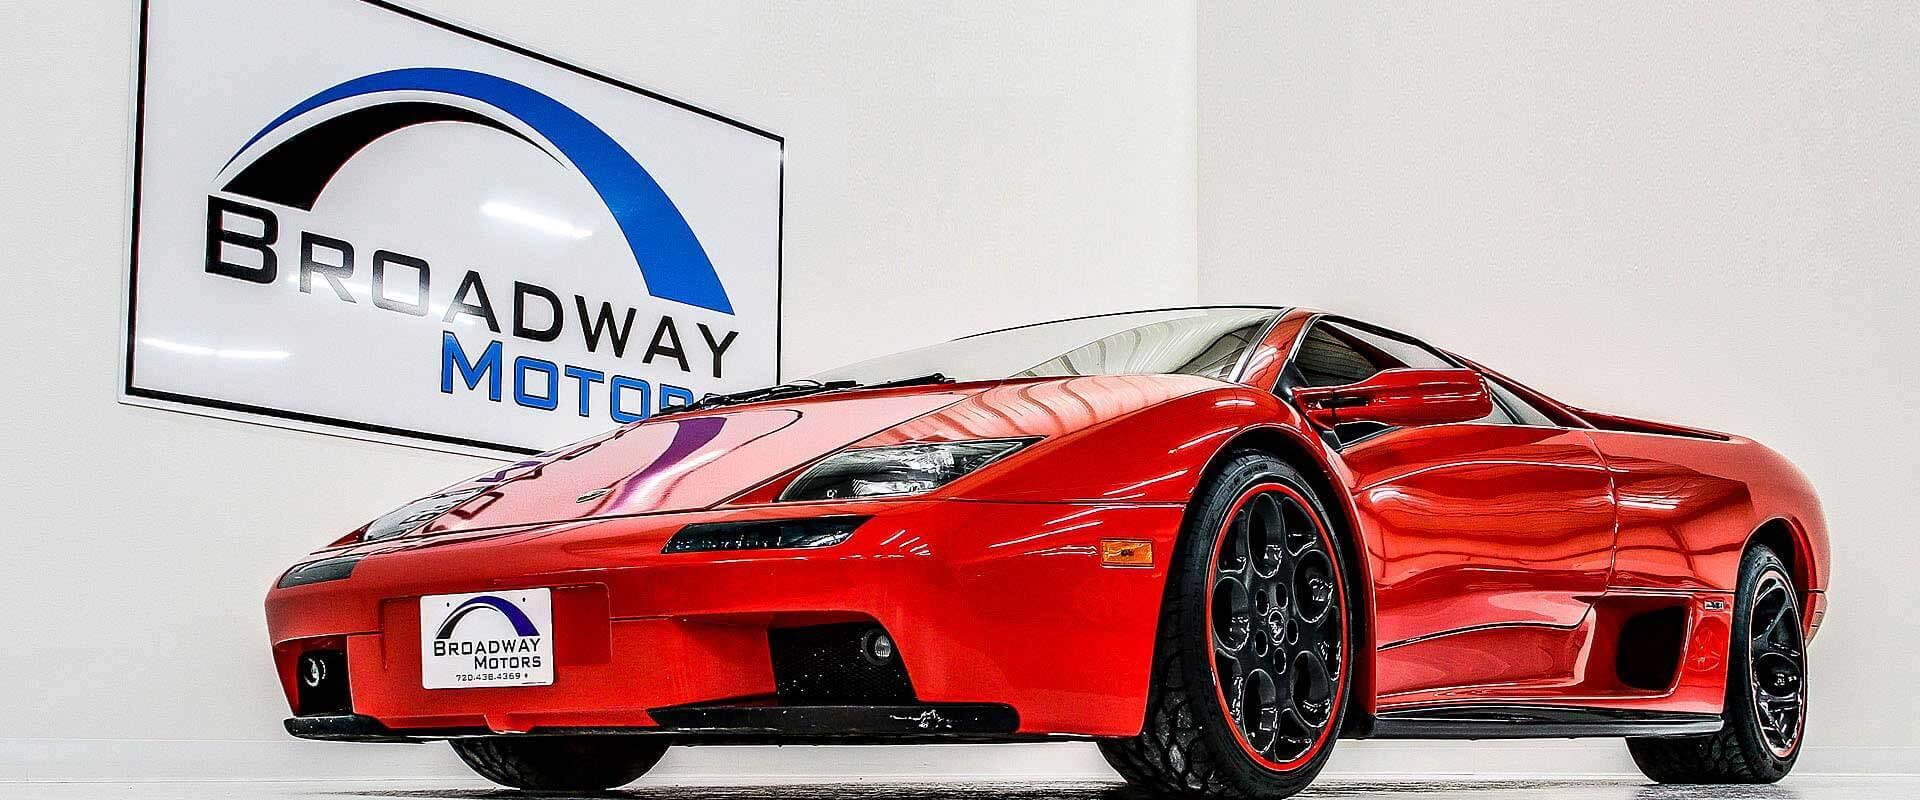 Dealership Longmont CO | Used Cars Broadway Motors